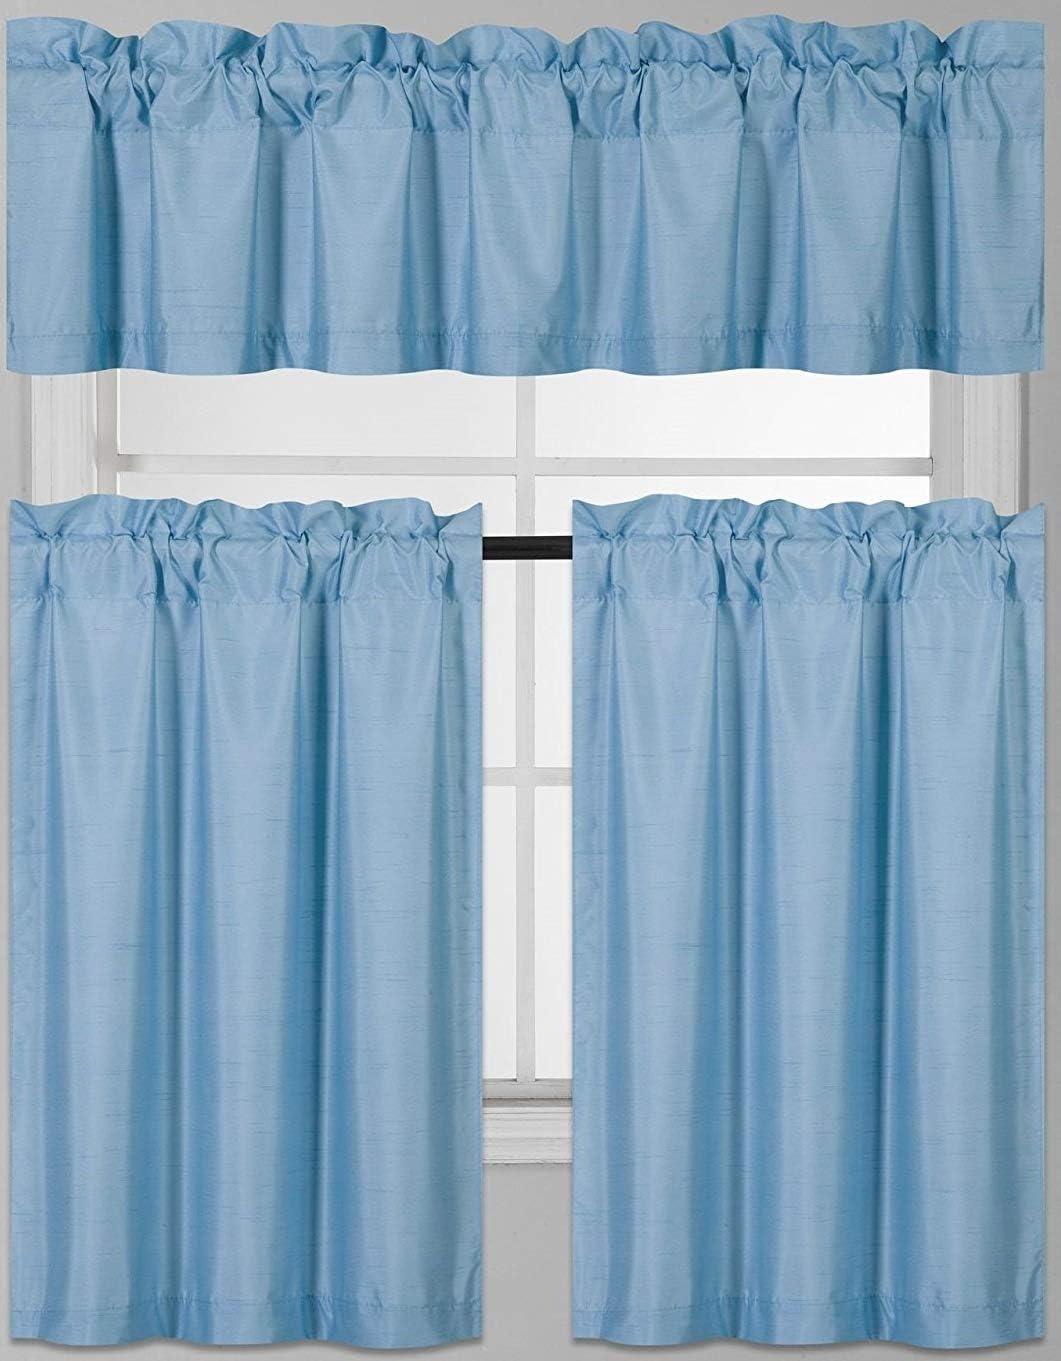 Goldenlinens 3 PC Kitchen Window Valance Tier Curtain Faux Silk Panels Room Darkens, Thermal Blackout Curtain Set (Light Blue)